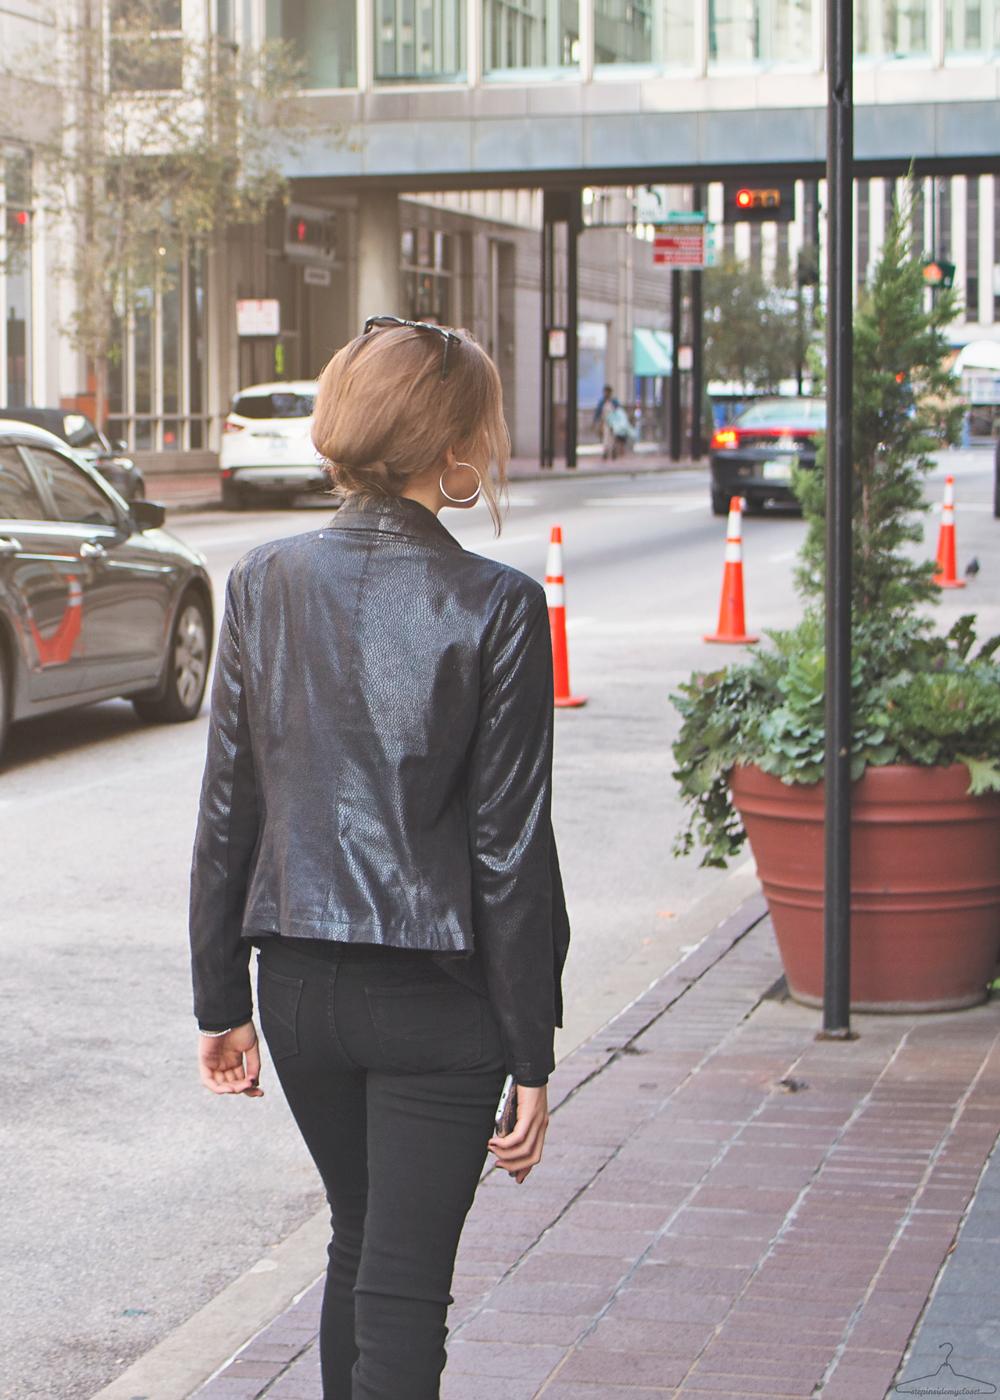 Step Inside My Closet - Noir Monday - Giuliana Rancid, Helmut Lang, Michael Kors, Rag & Bone, Zara,